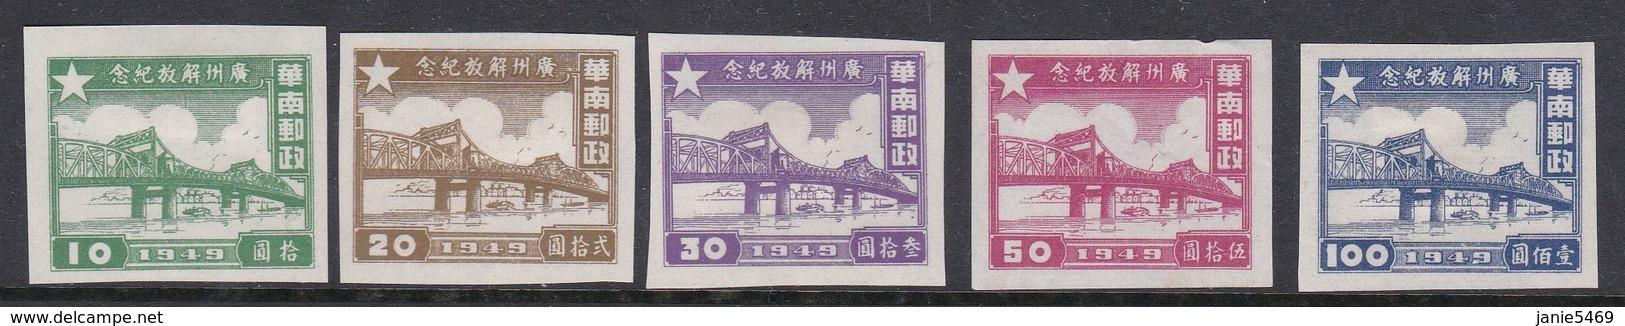 China South China Scott 7L1-7L5 1949 Pearl River Bridge, Mint Hinged - Southern-China 1949-50